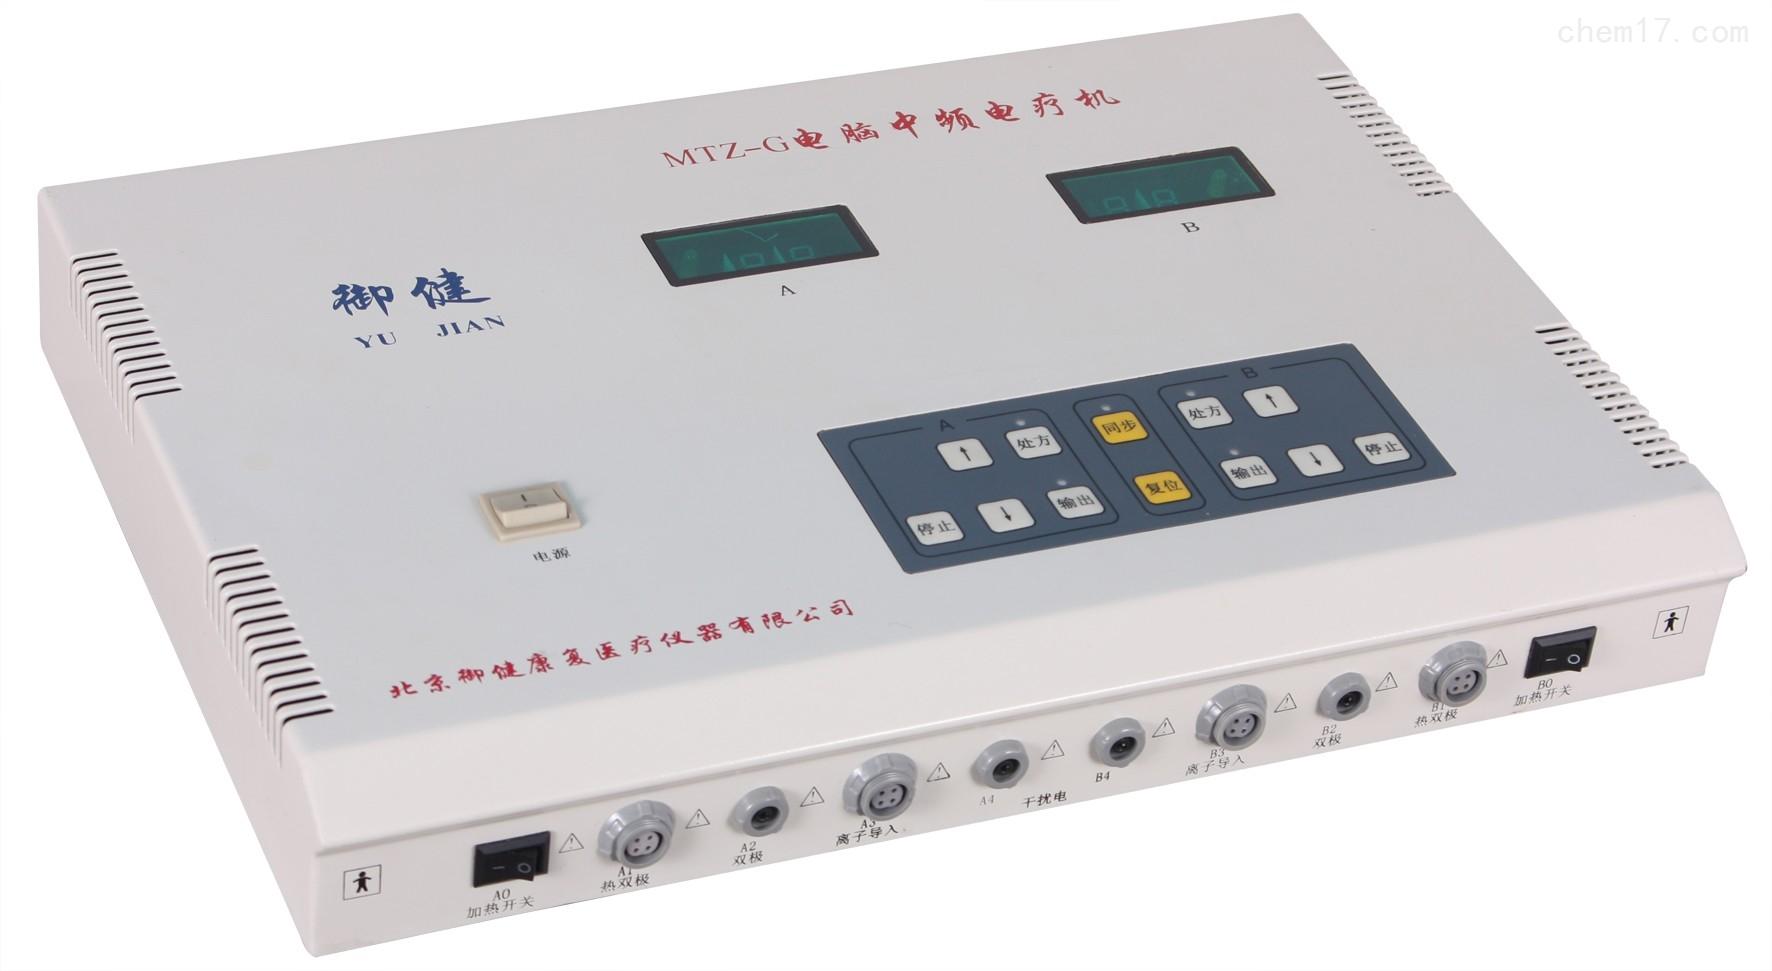 MTZ-G电脑中频治疗仪.jpg